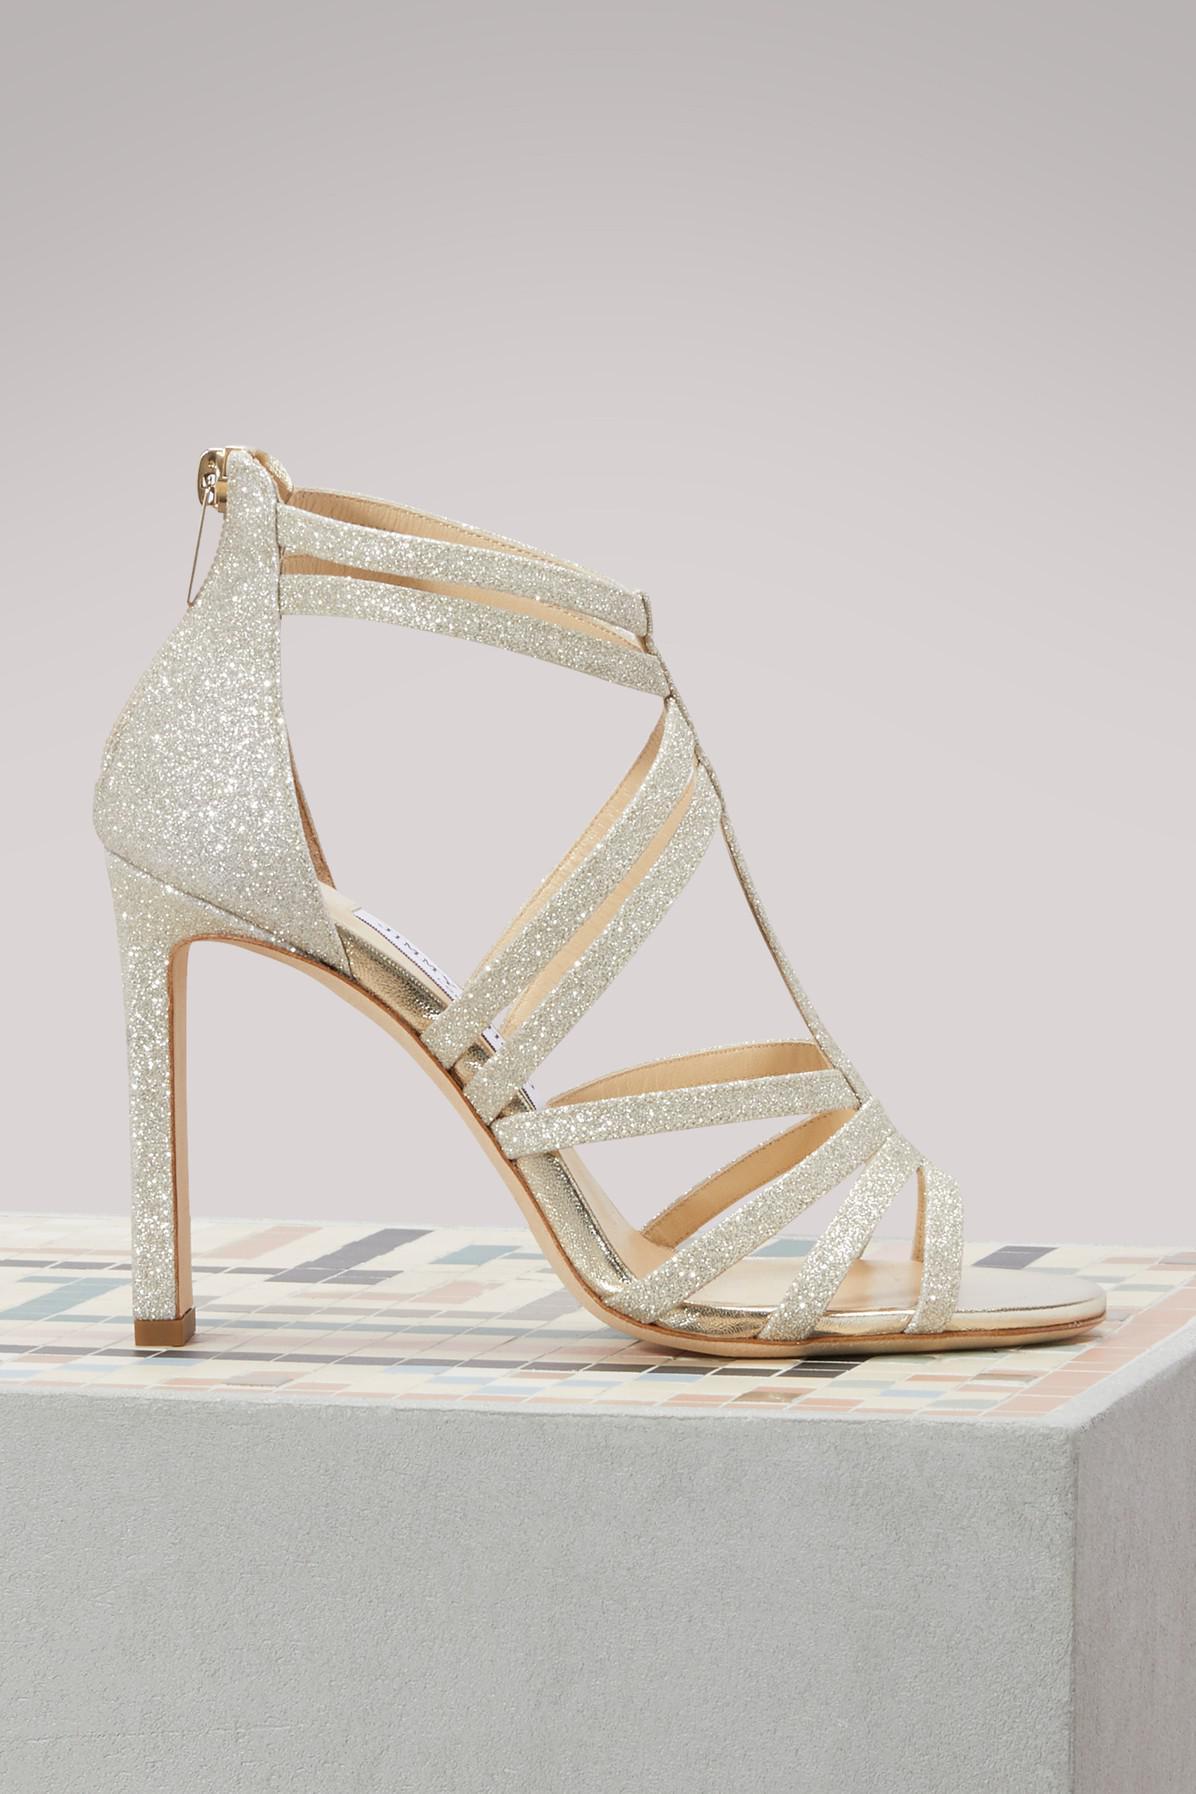 5375733f5c5 Lyst - Jimmy Choo Selina 100 Sandals